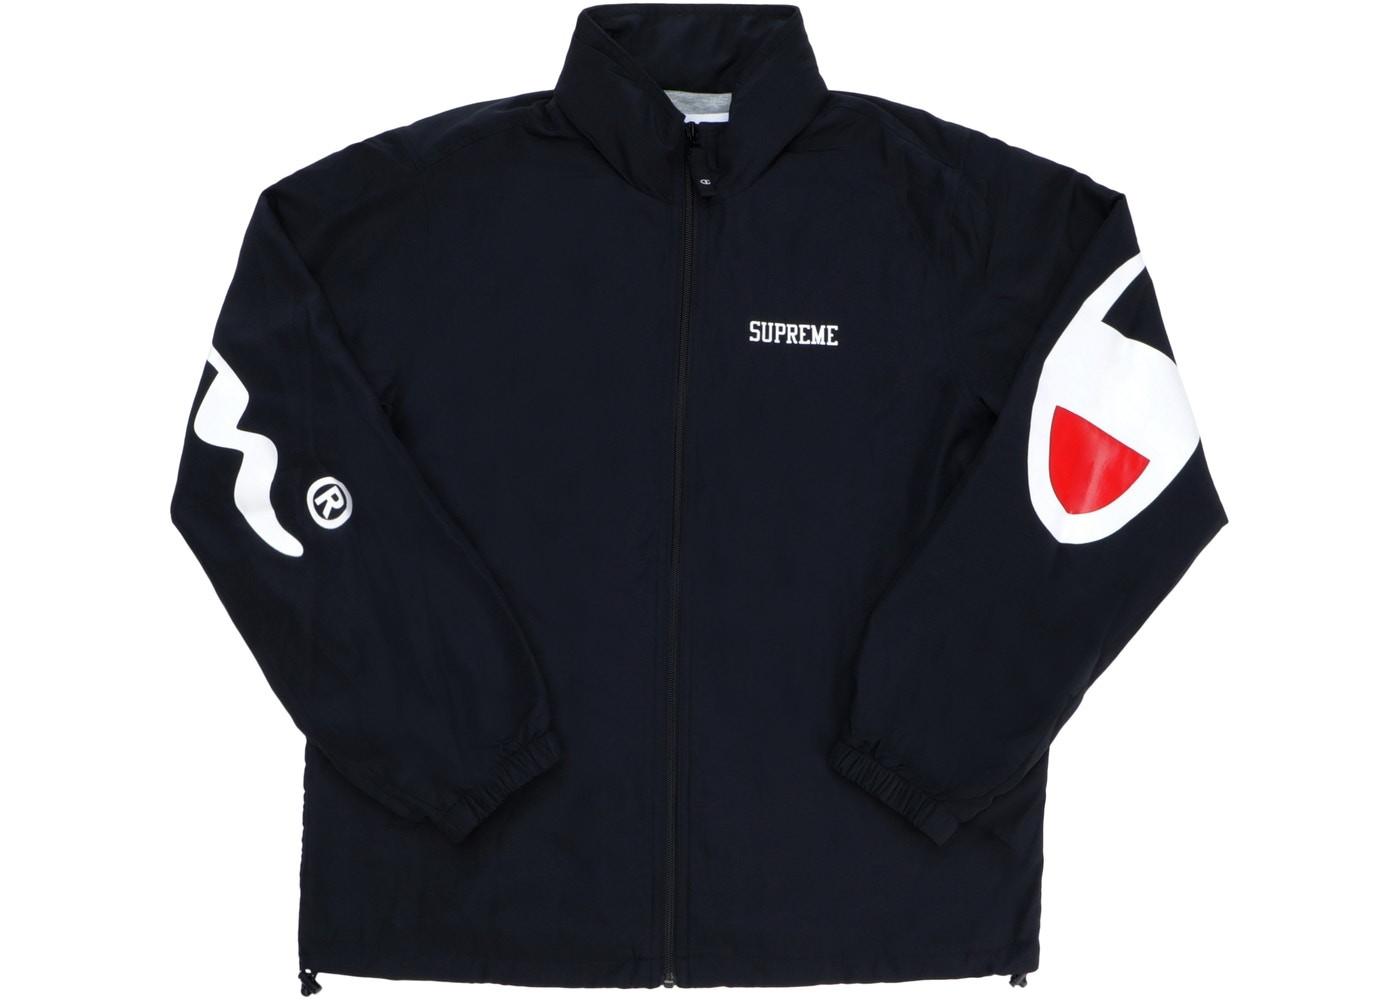 59fca400807a54 Supreme Champion Track Jacket